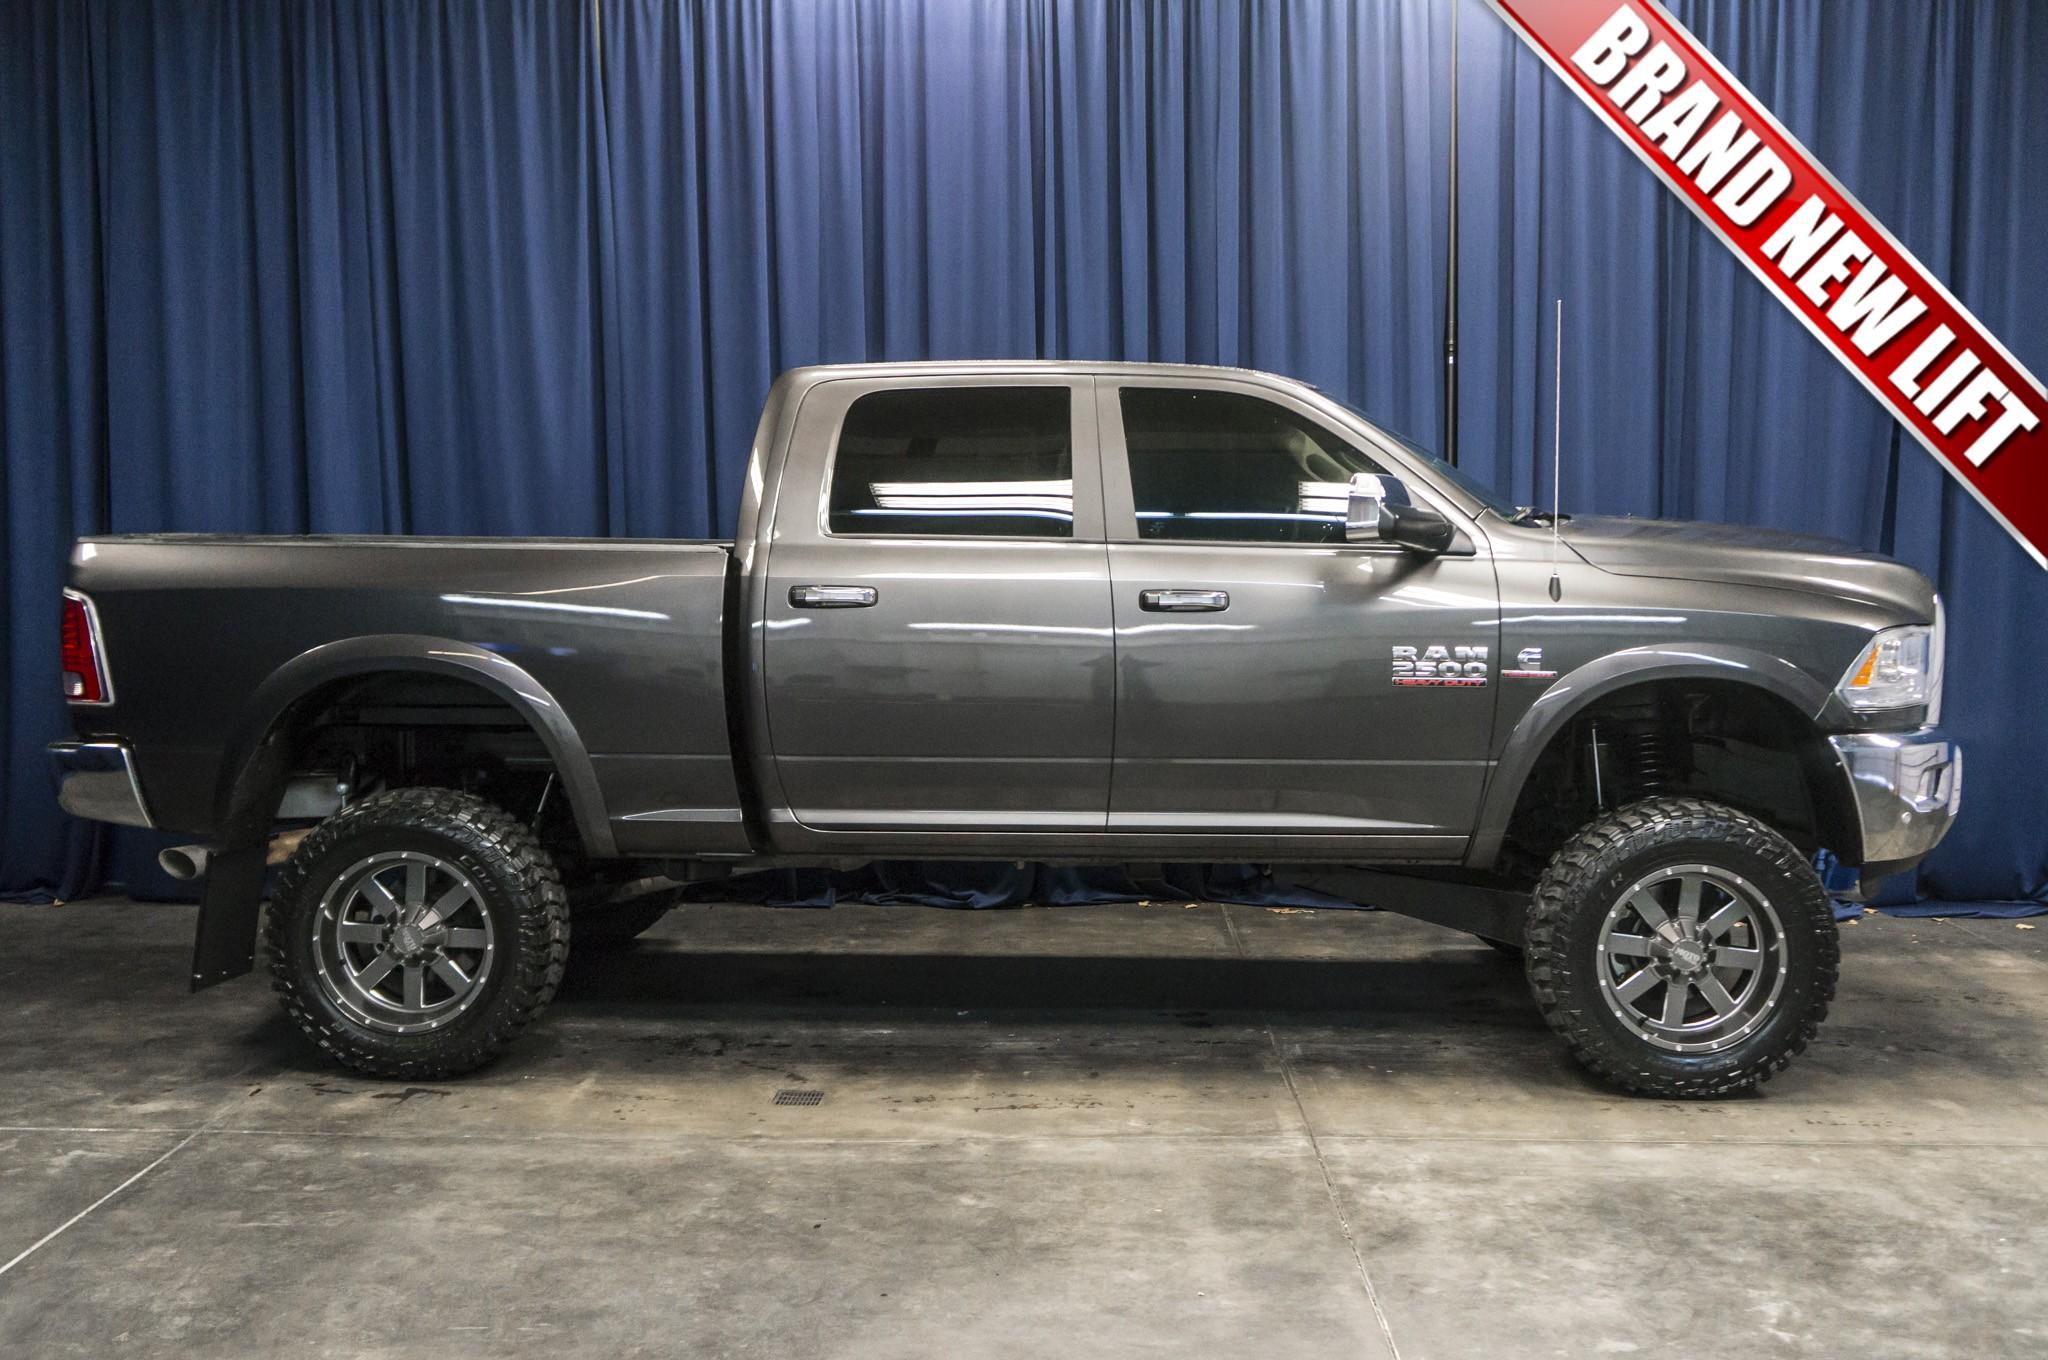 used lifted 2016 dodge ram 2500 laramie 4x4 diesel truck for sale 36904. Black Bedroom Furniture Sets. Home Design Ideas